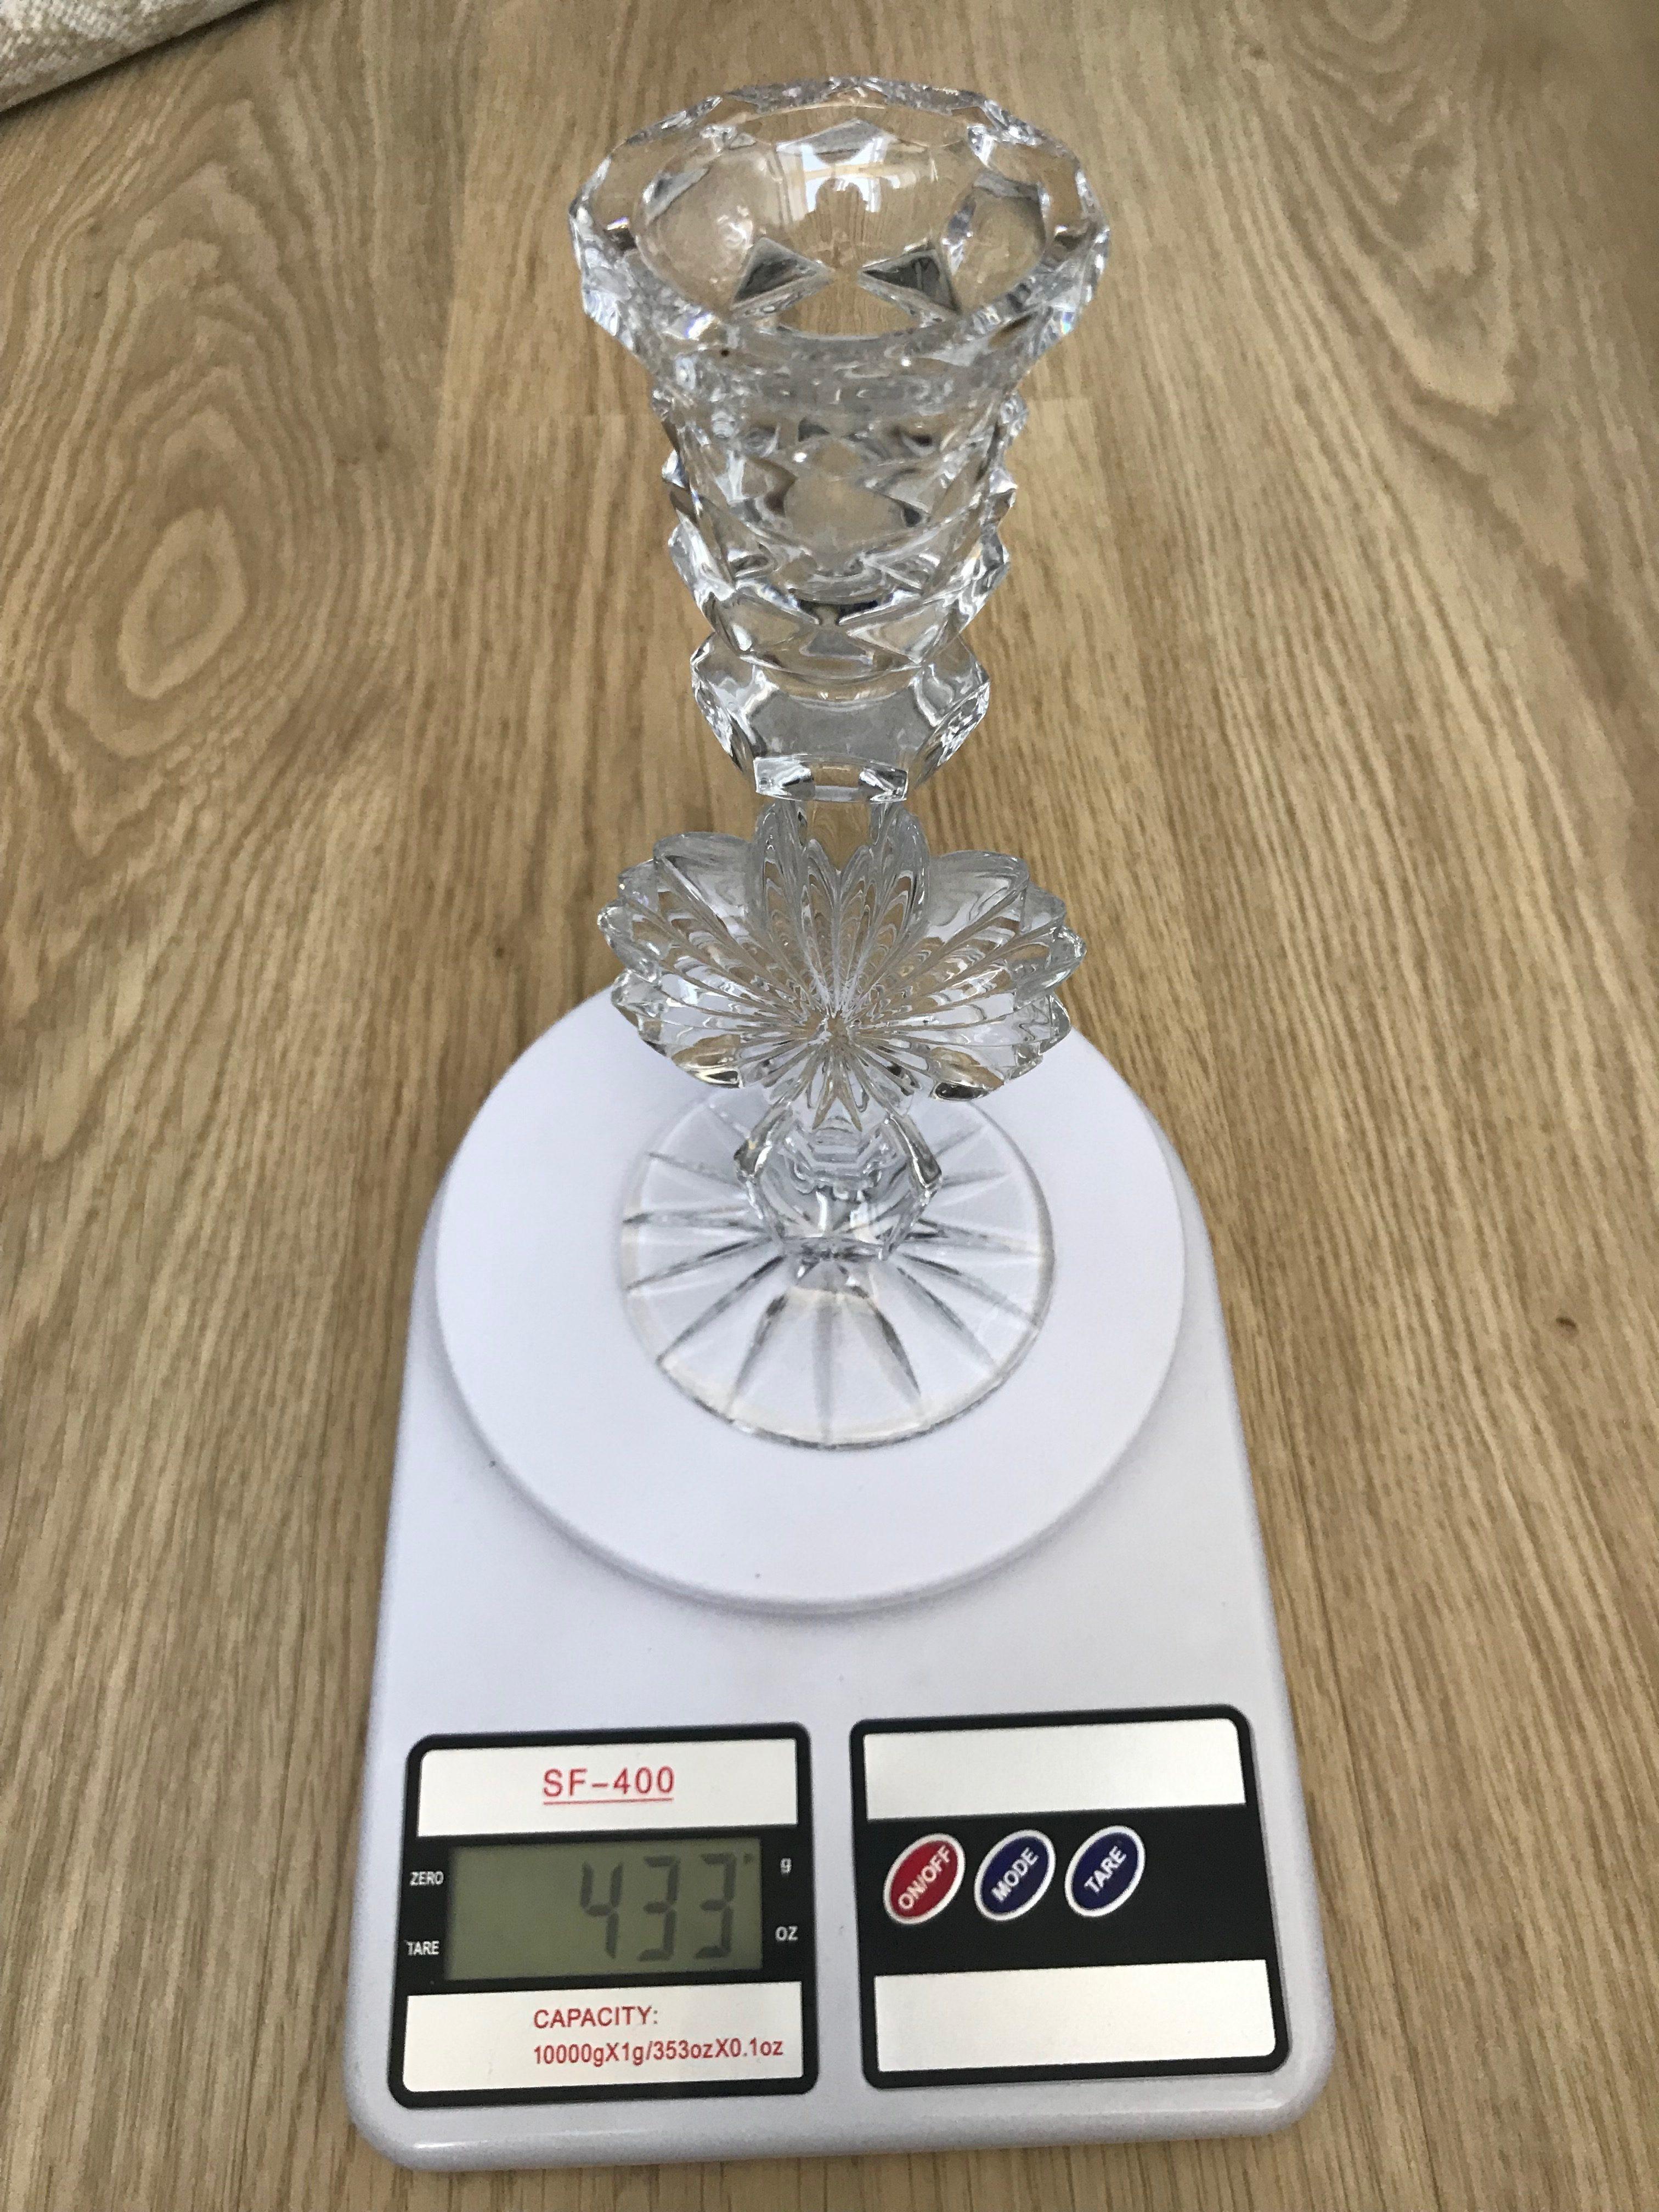 вес подсвечника